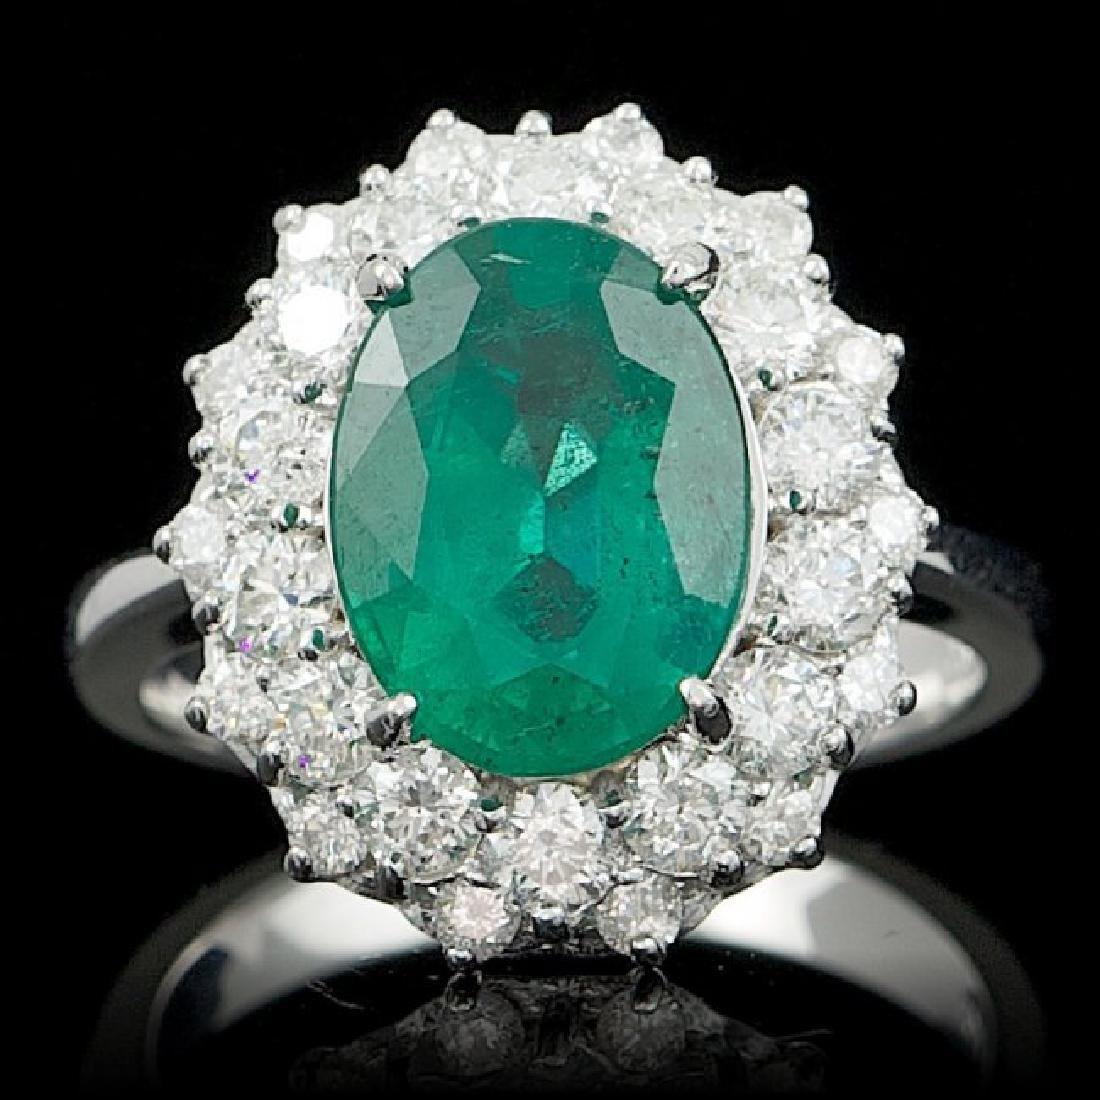 14k White Gold 3.50ct Emerald 1.55ct Diamond Ring - 2